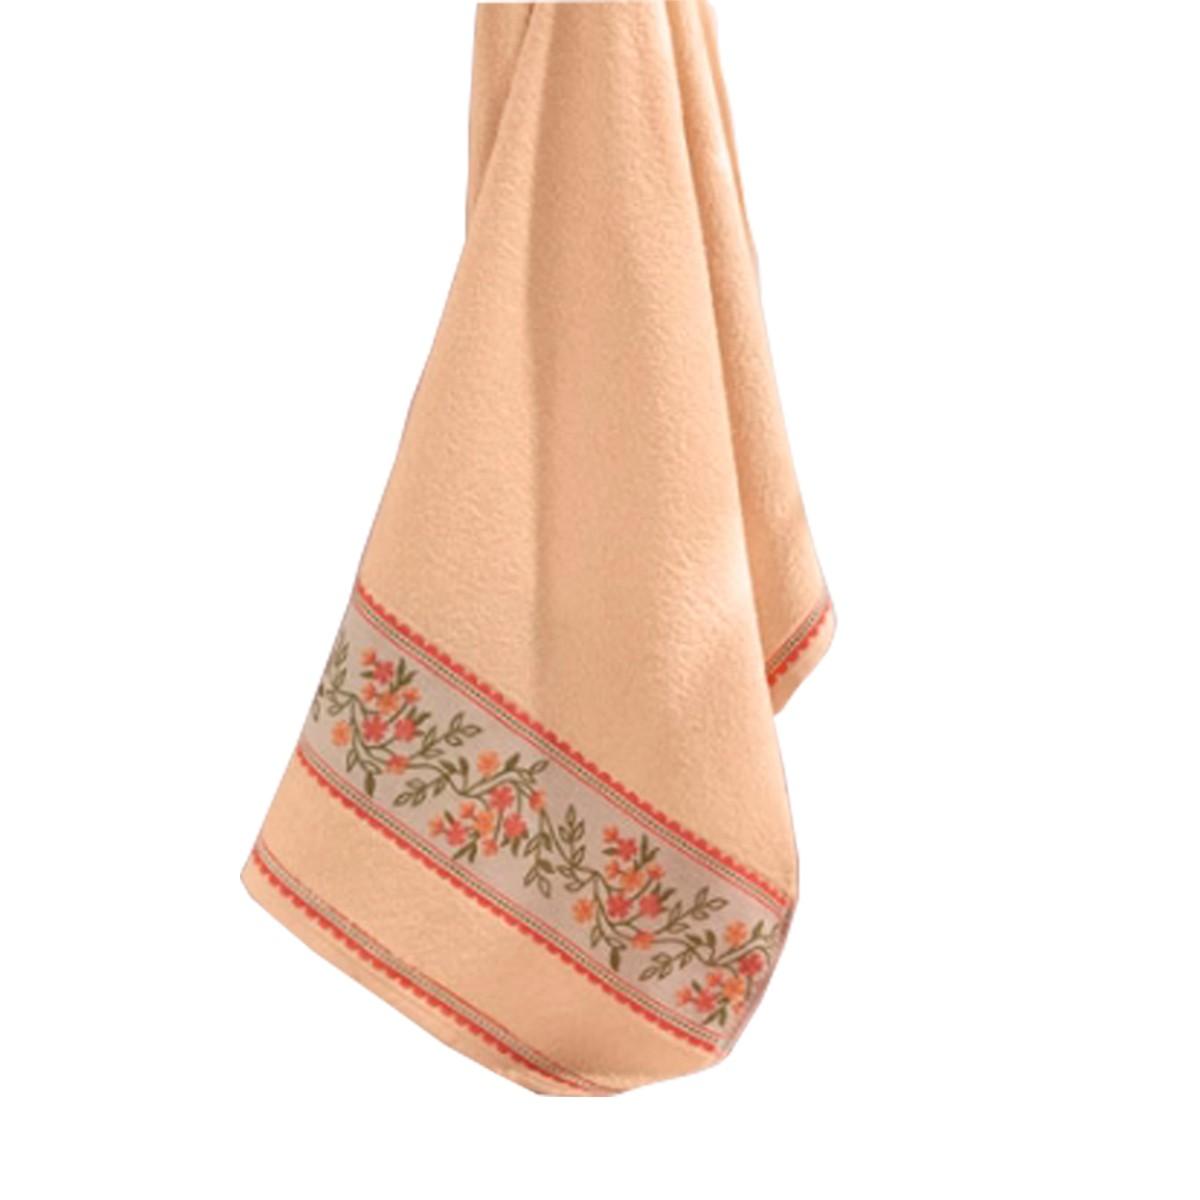 Toalha de Banho Apricot/Laranja Lufamar